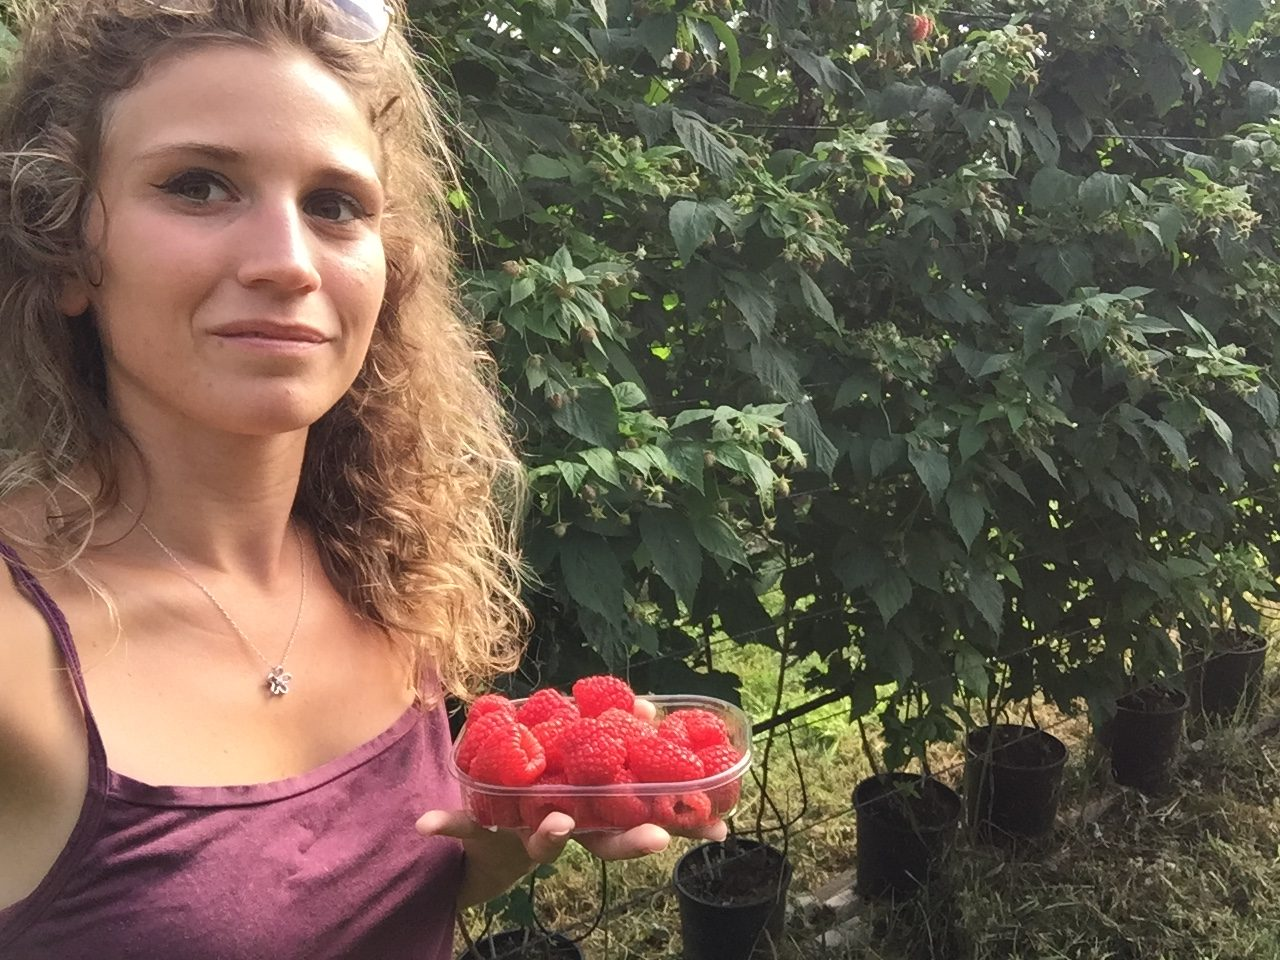 Martina Tessadri, giovanissima imprenditrice agricola